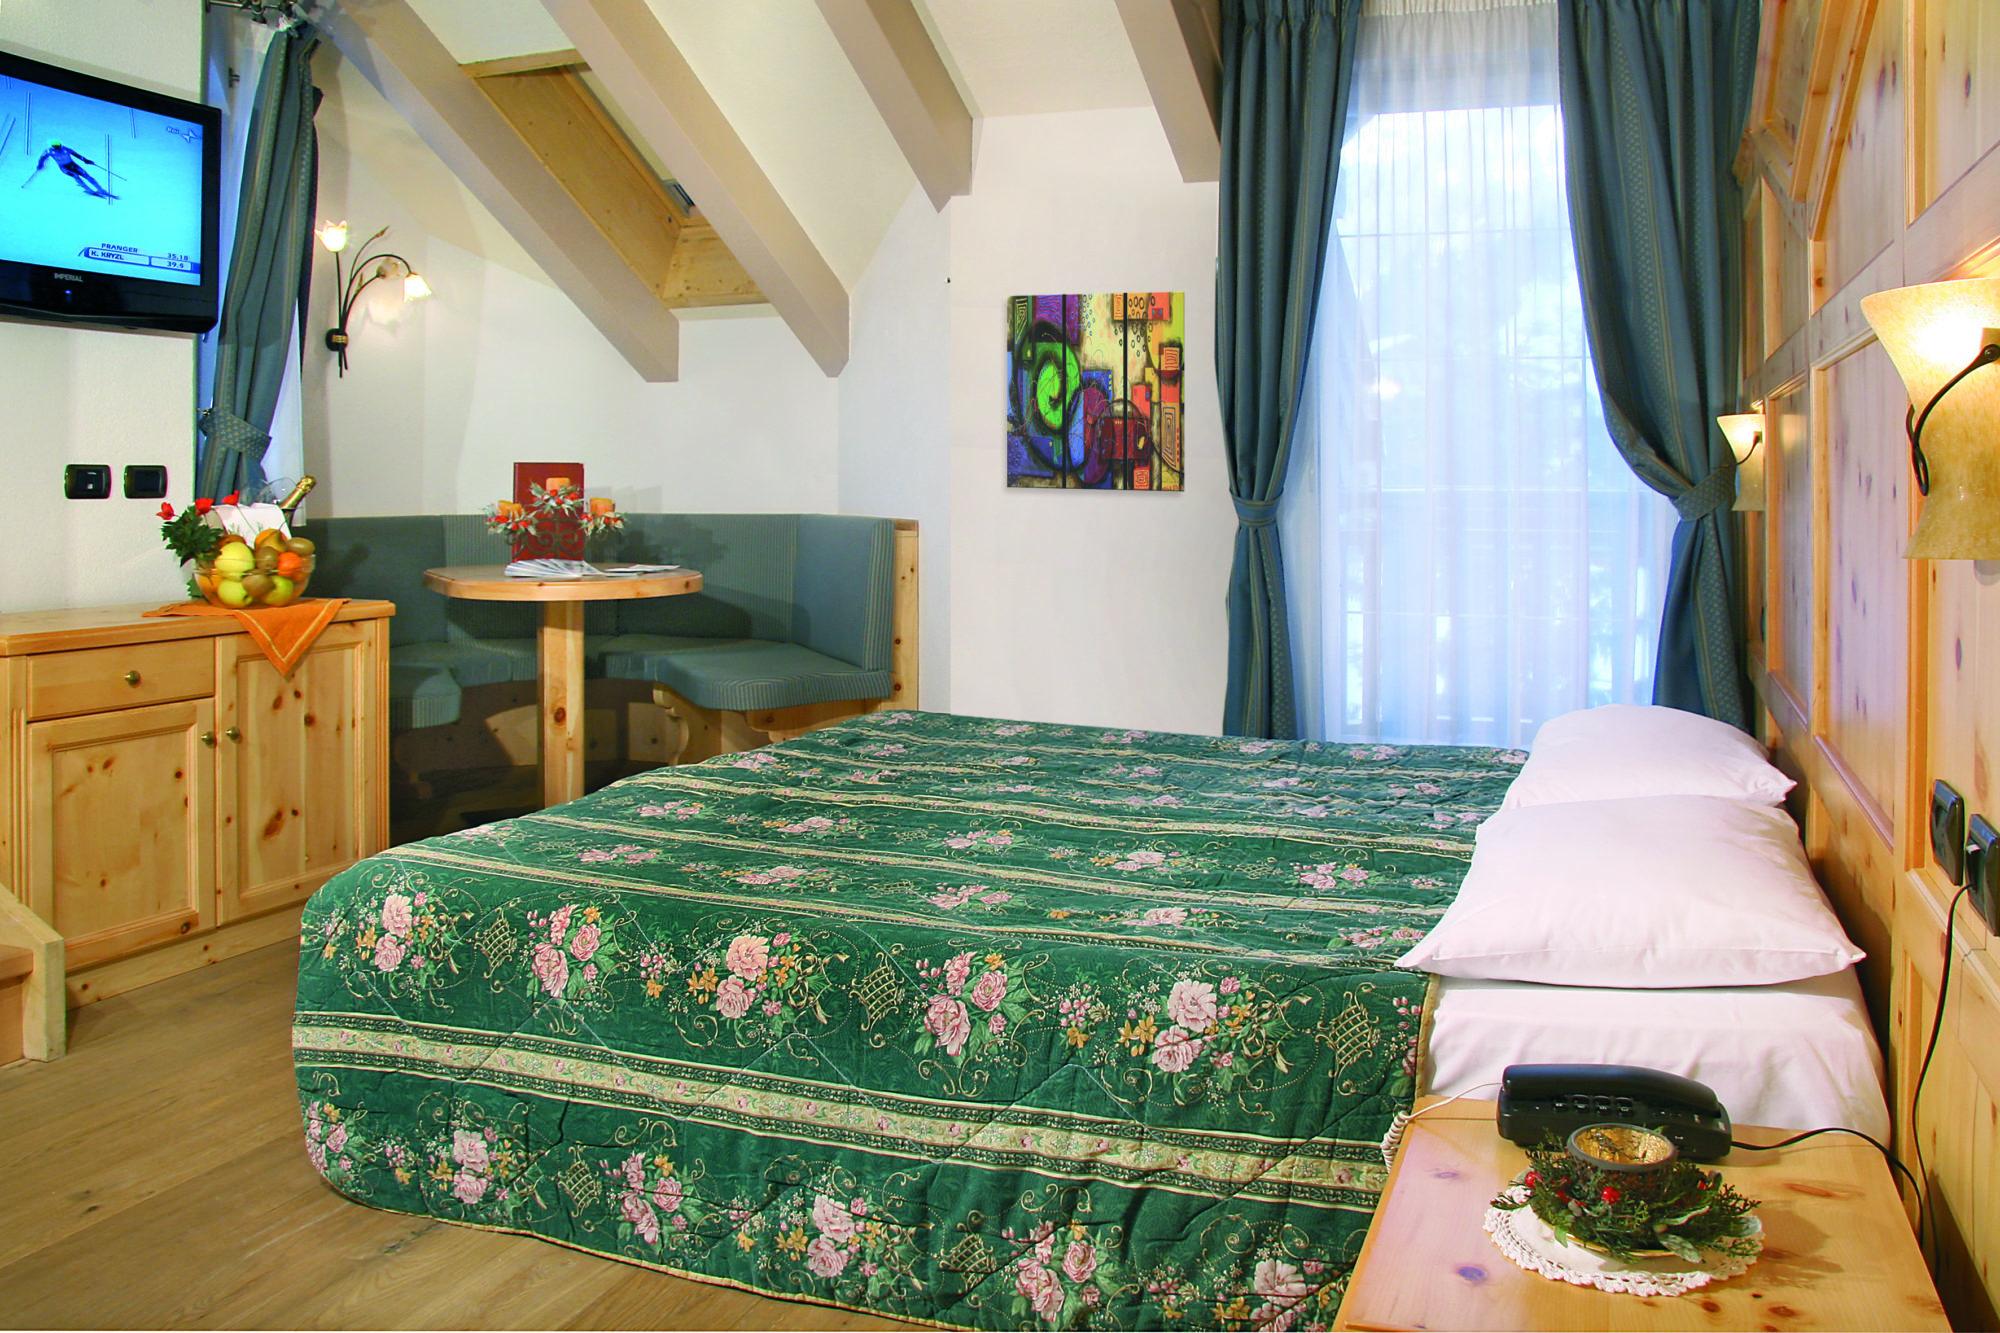 10c Hotel Soreghes - camera